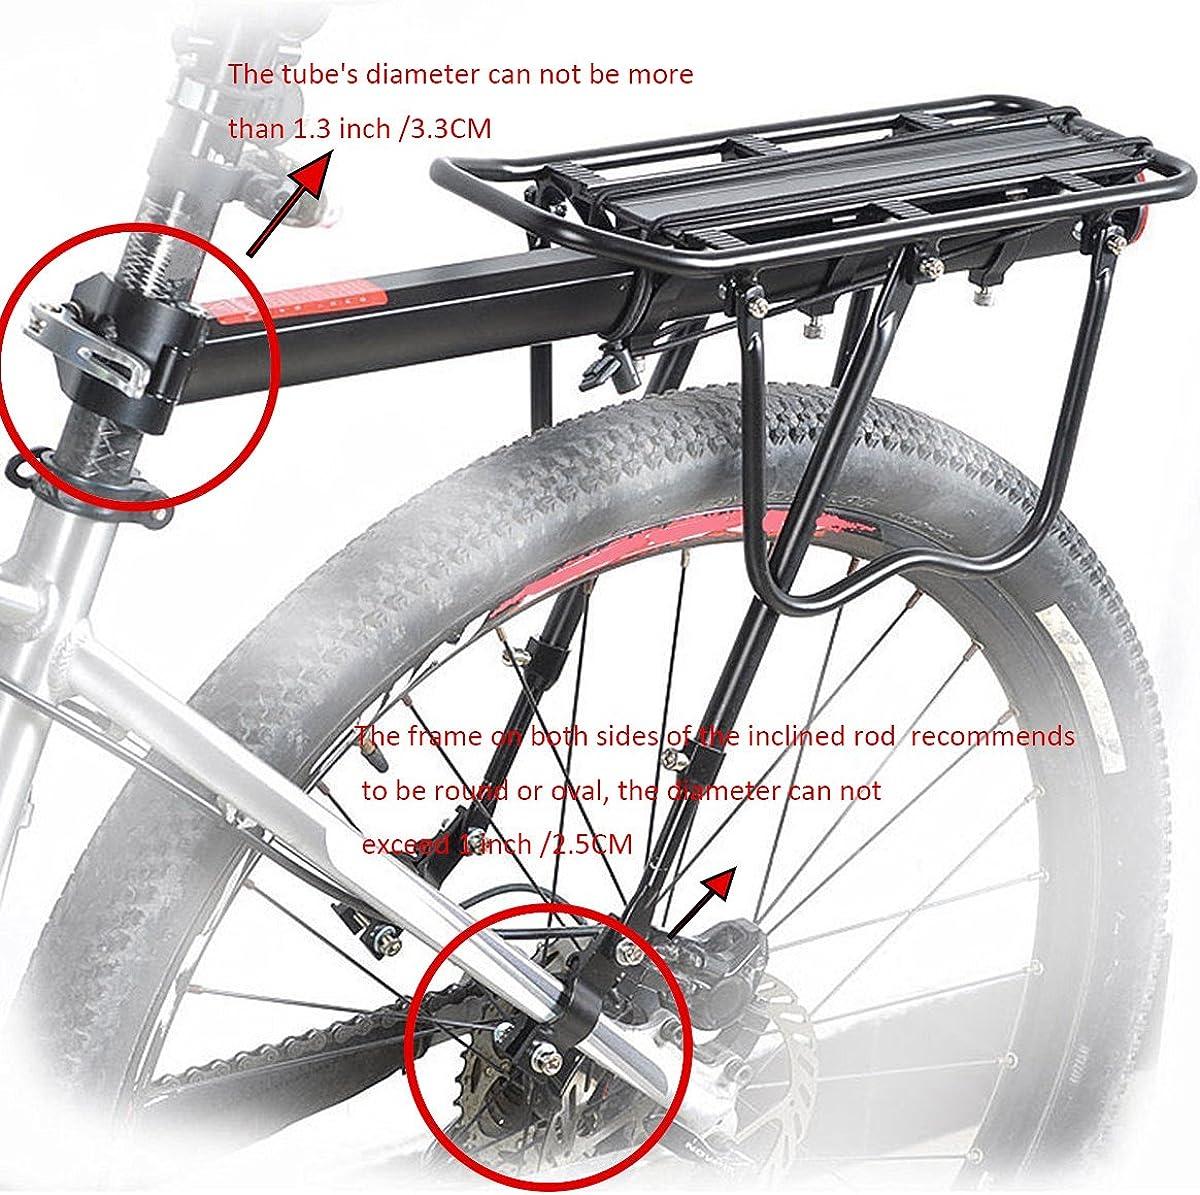 BLACK ADJUSTABLE BICYCLE SEAT BOLT BIKE PARTS 43